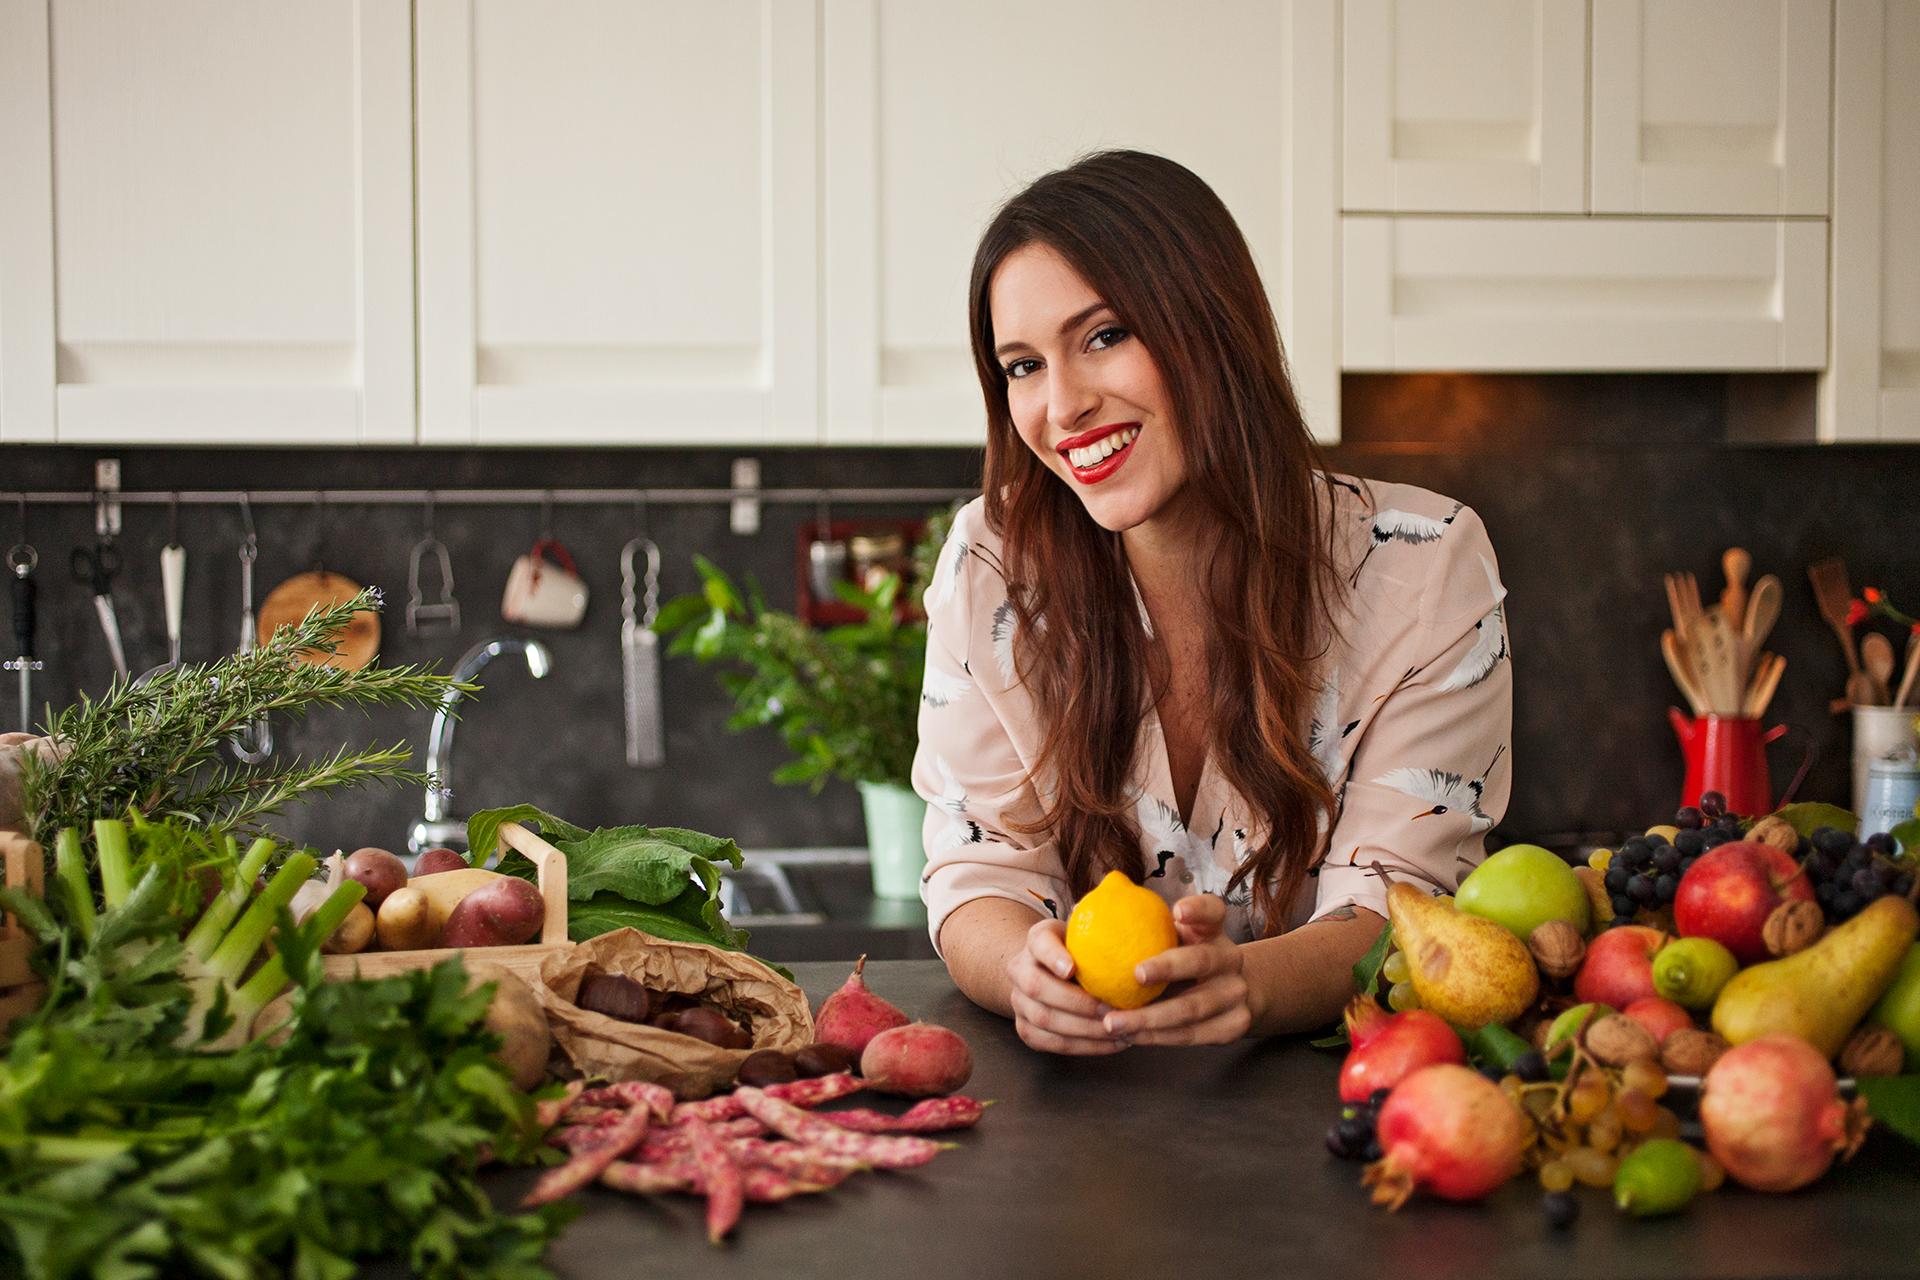 Radici il blog di cucina di chiara canzian - Chiara blogger cucina ...